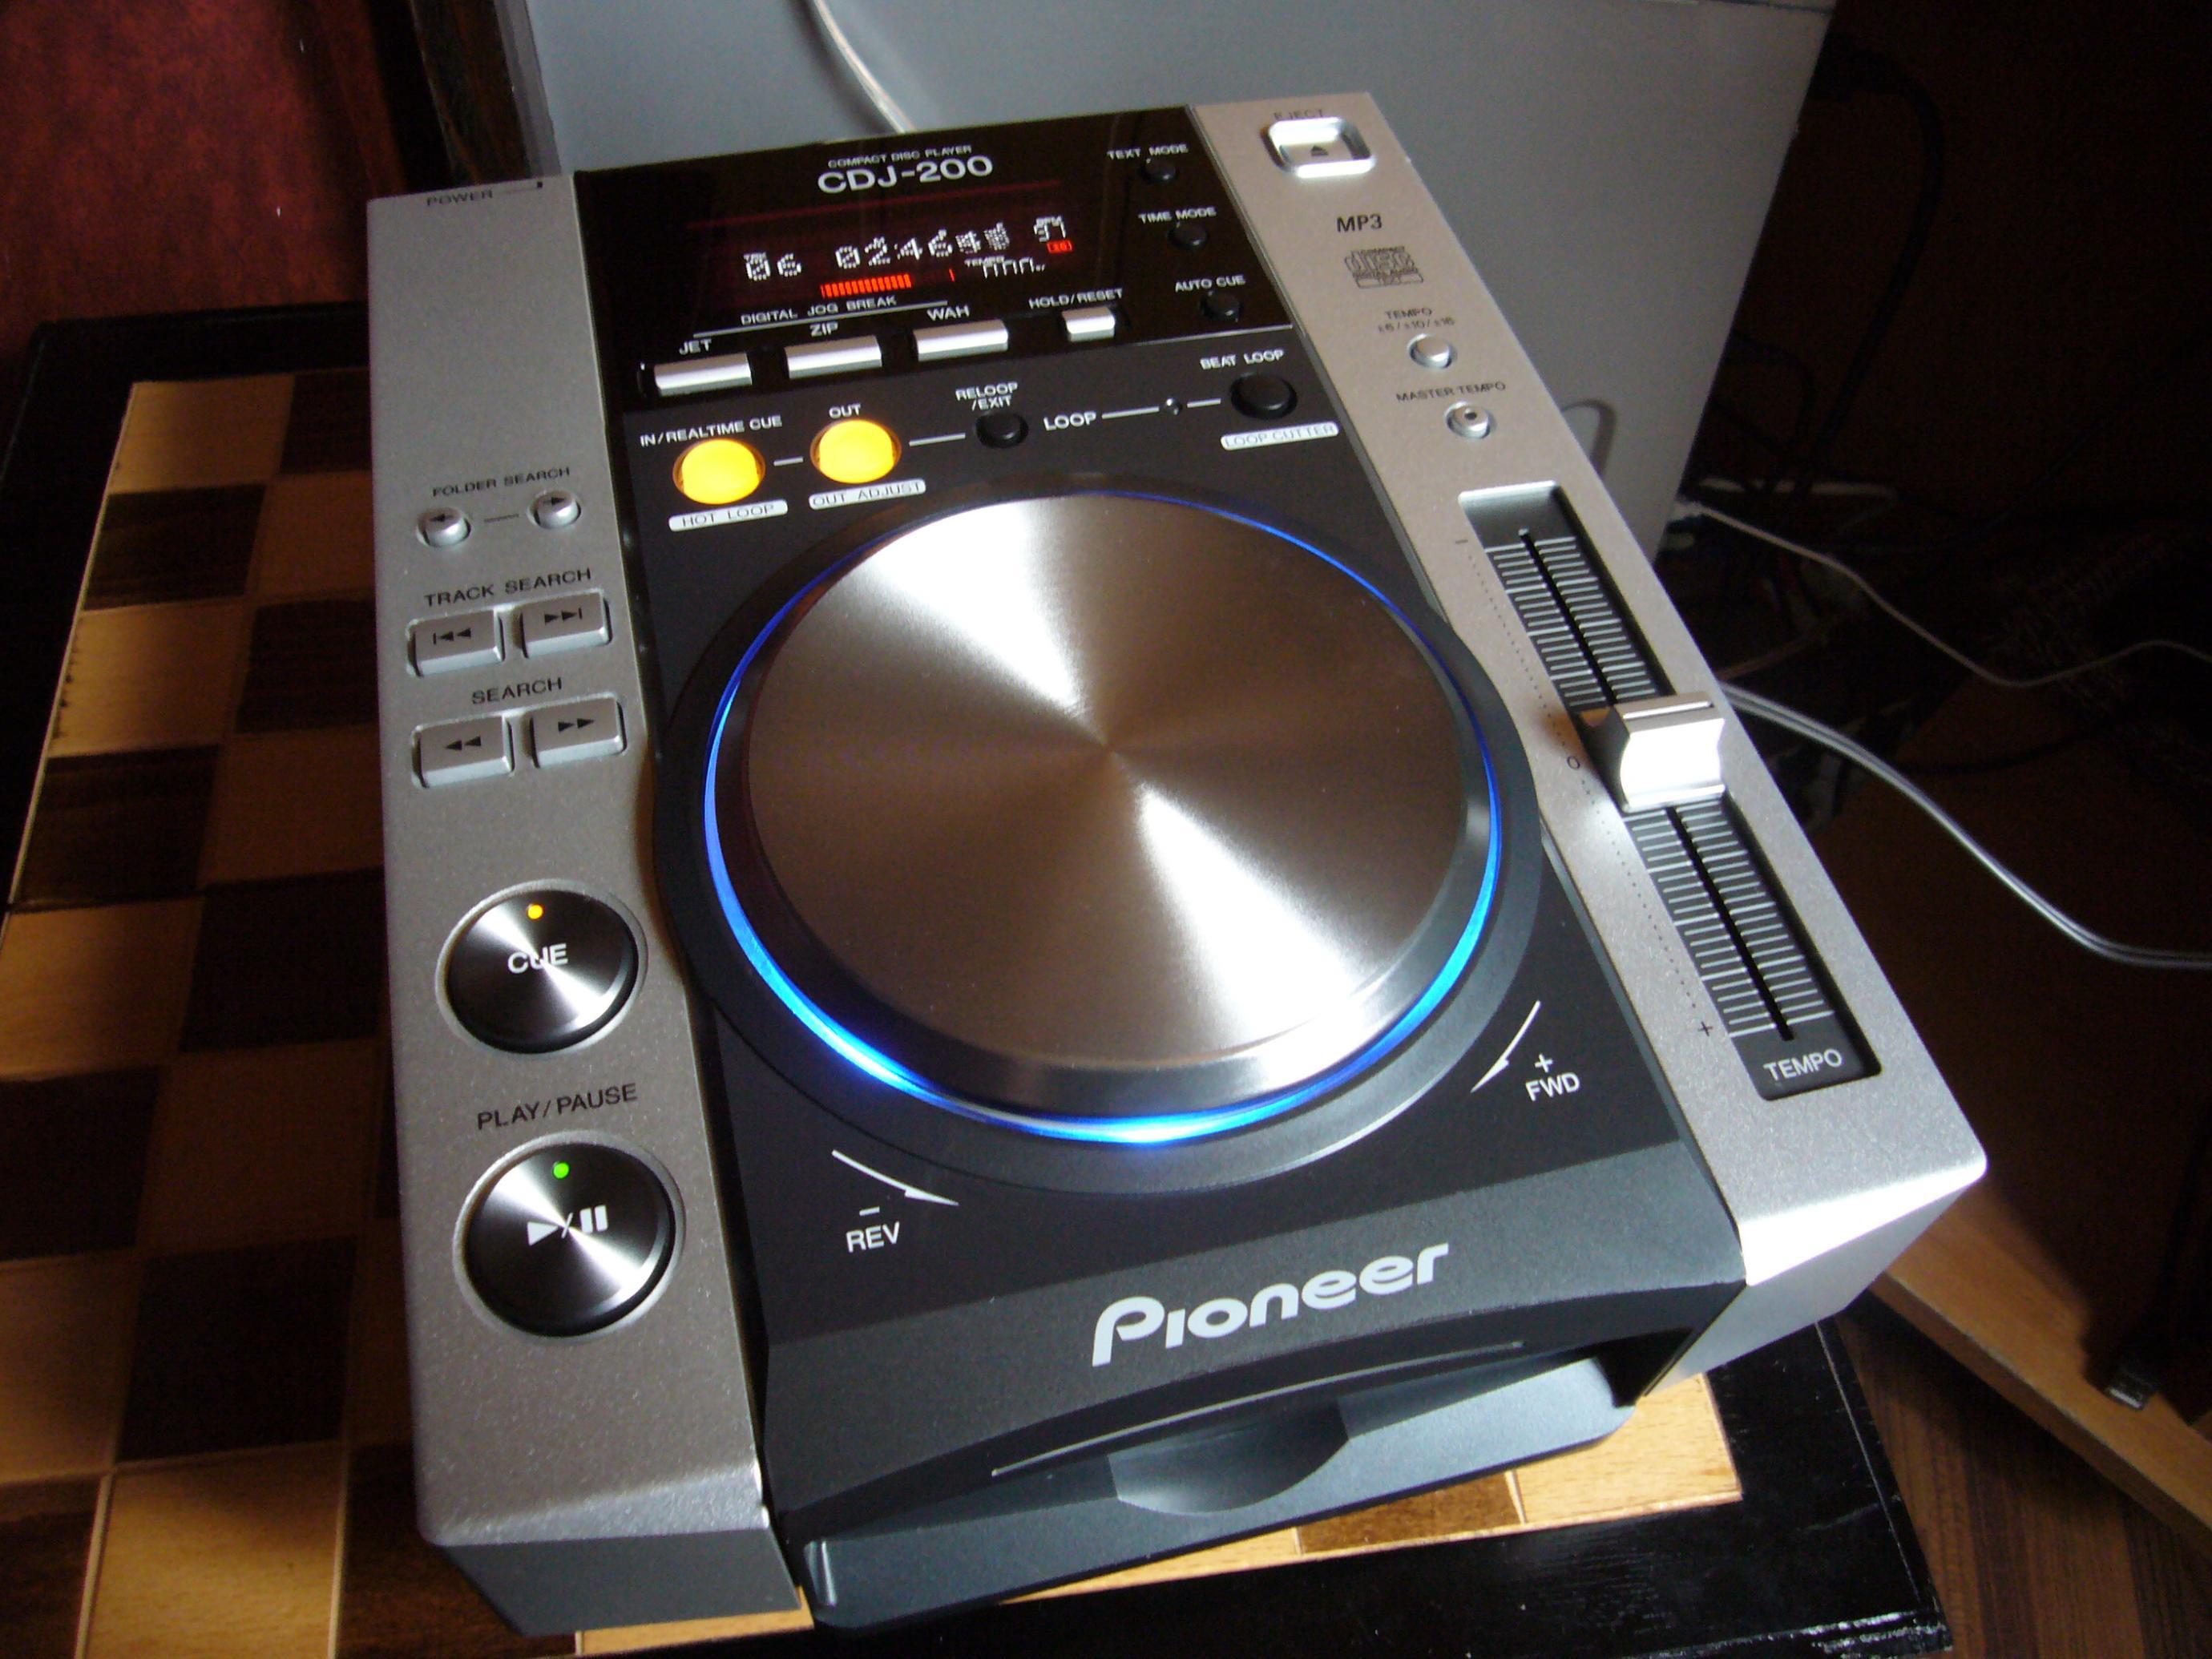 pioneer cdj 200 image pioneer cdj 200 569829 audiofanzine. Black Bedroom Furniture Sets. Home Design Ideas